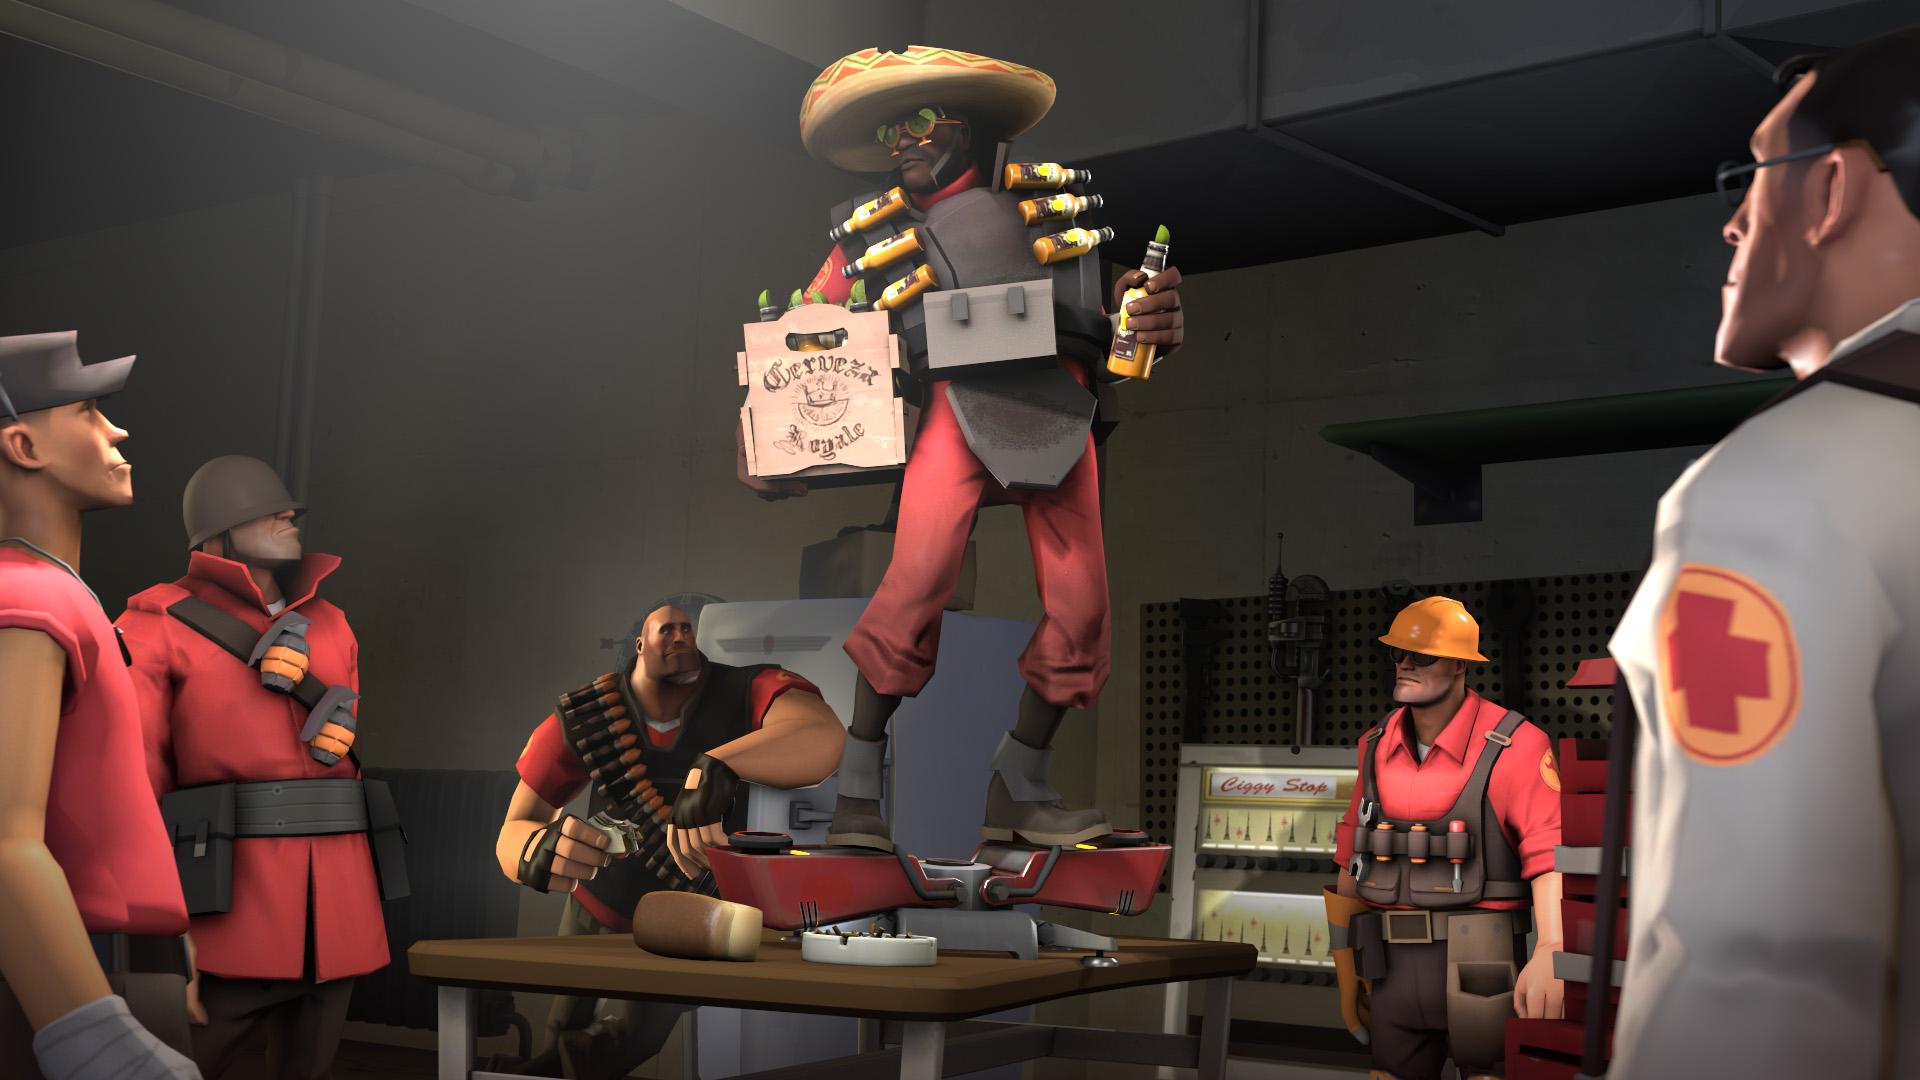 Team Fortress 2 bate recorde de jogadores simultâneos após 14 anos | Jogos